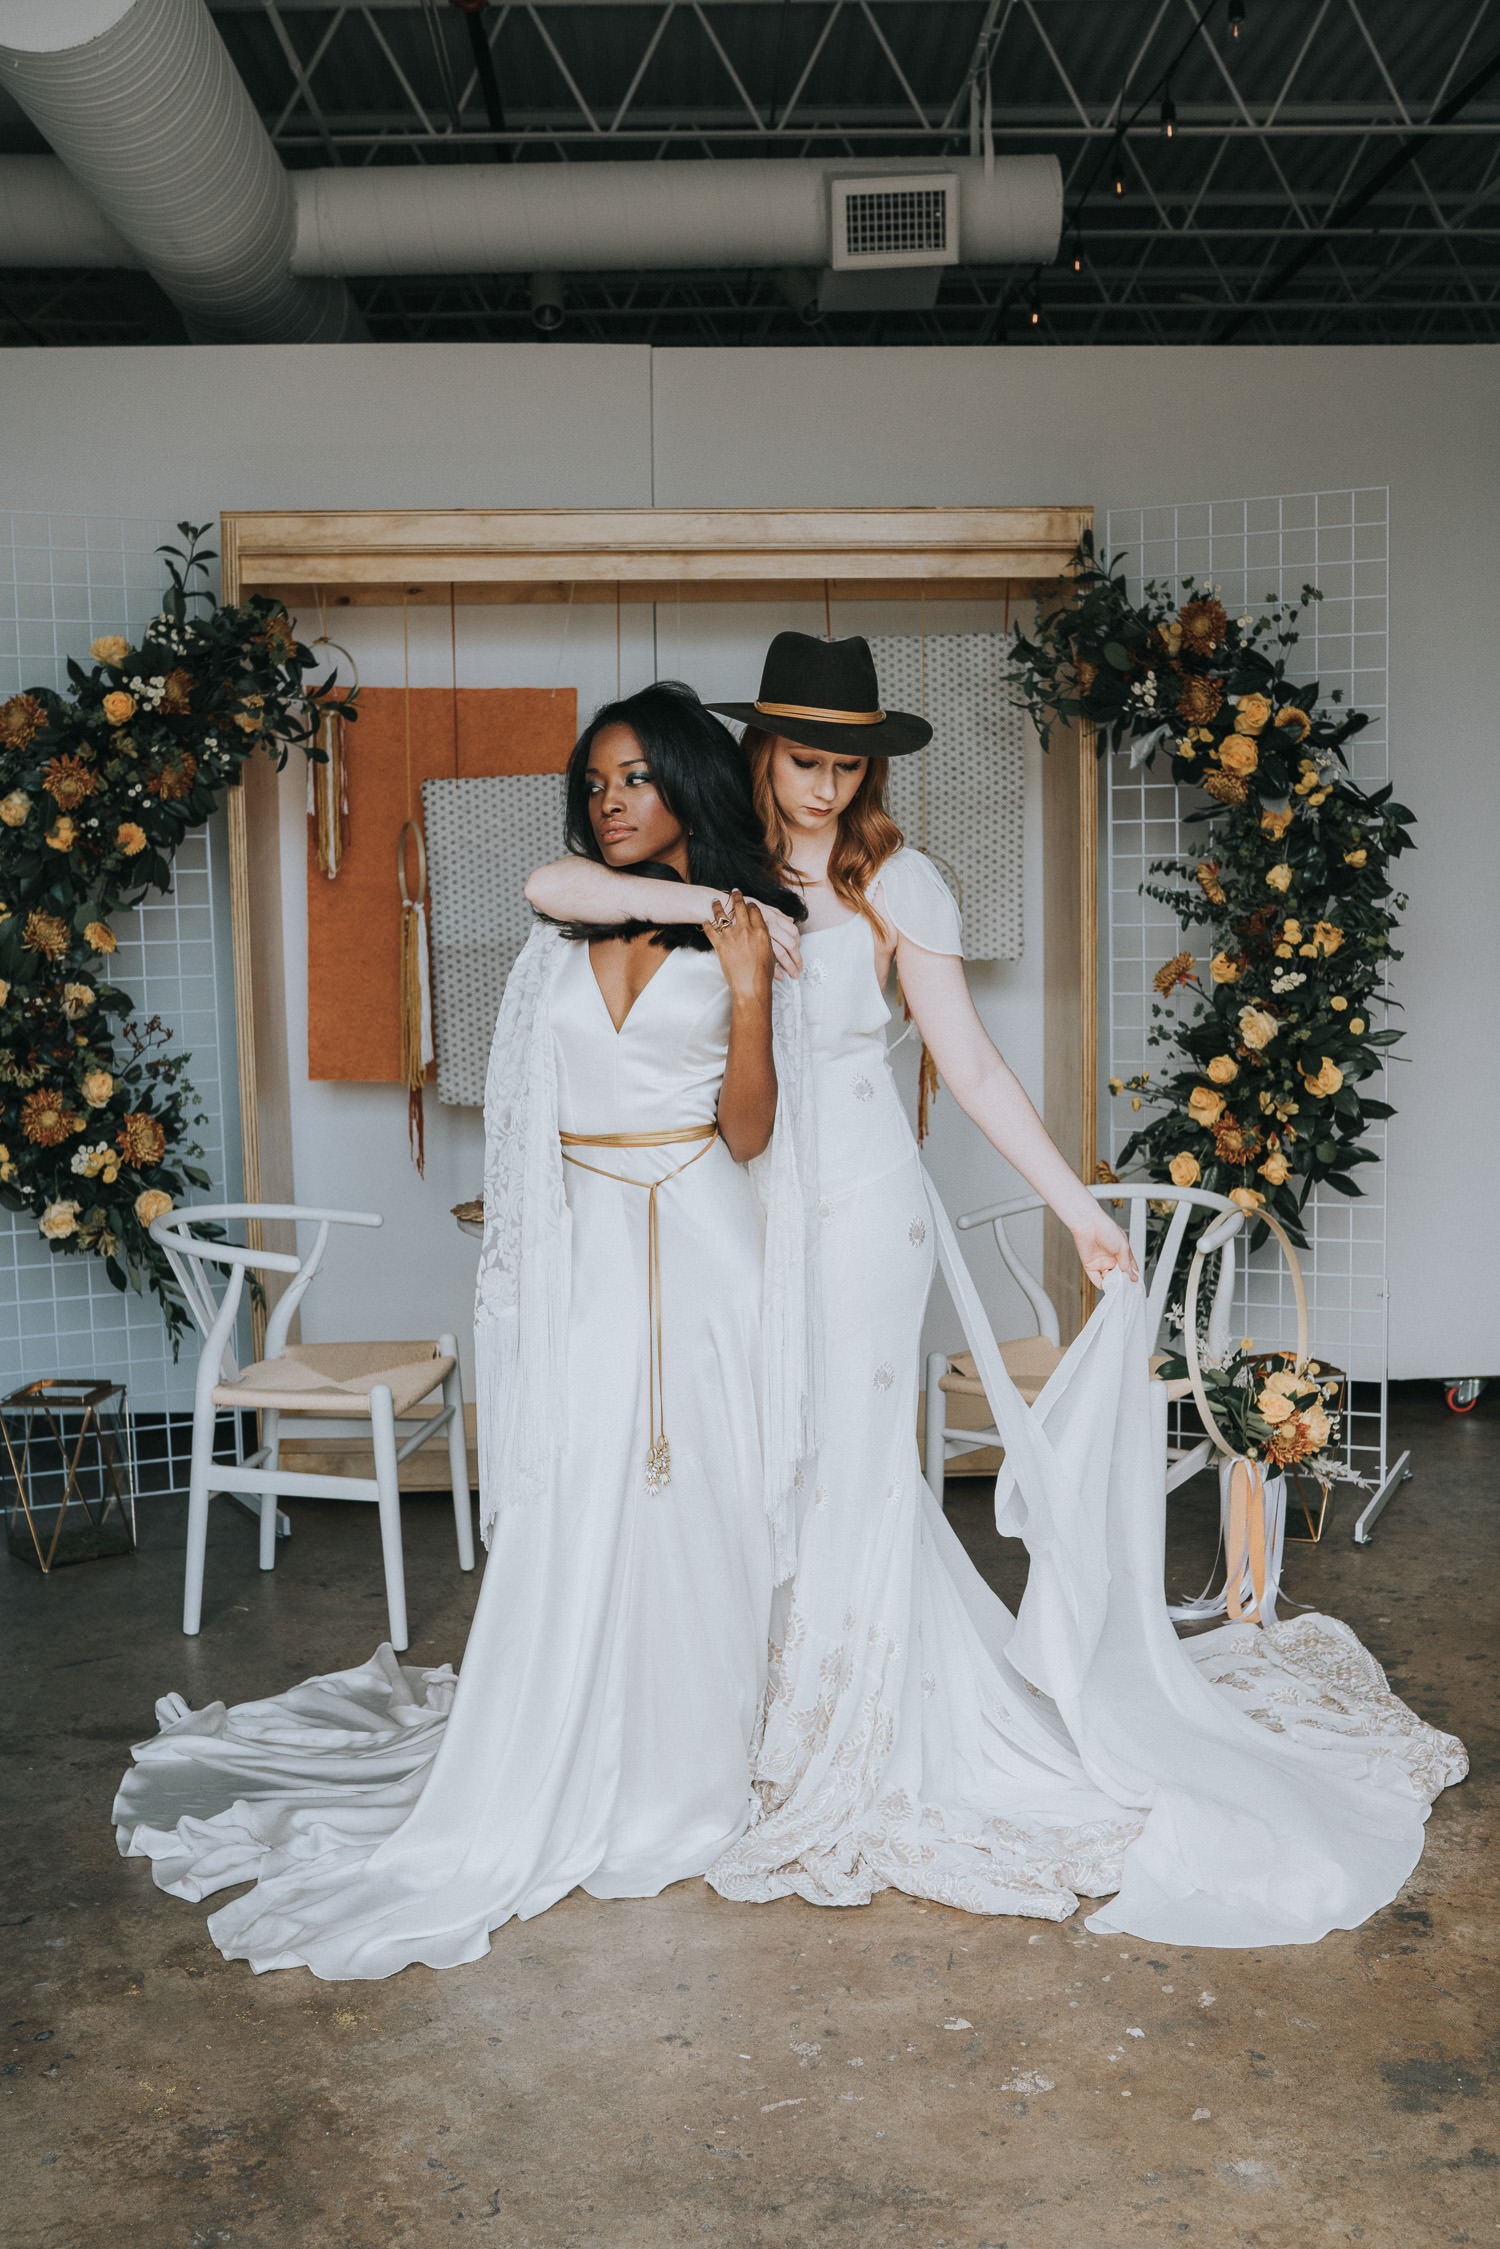 70s inspired wedding